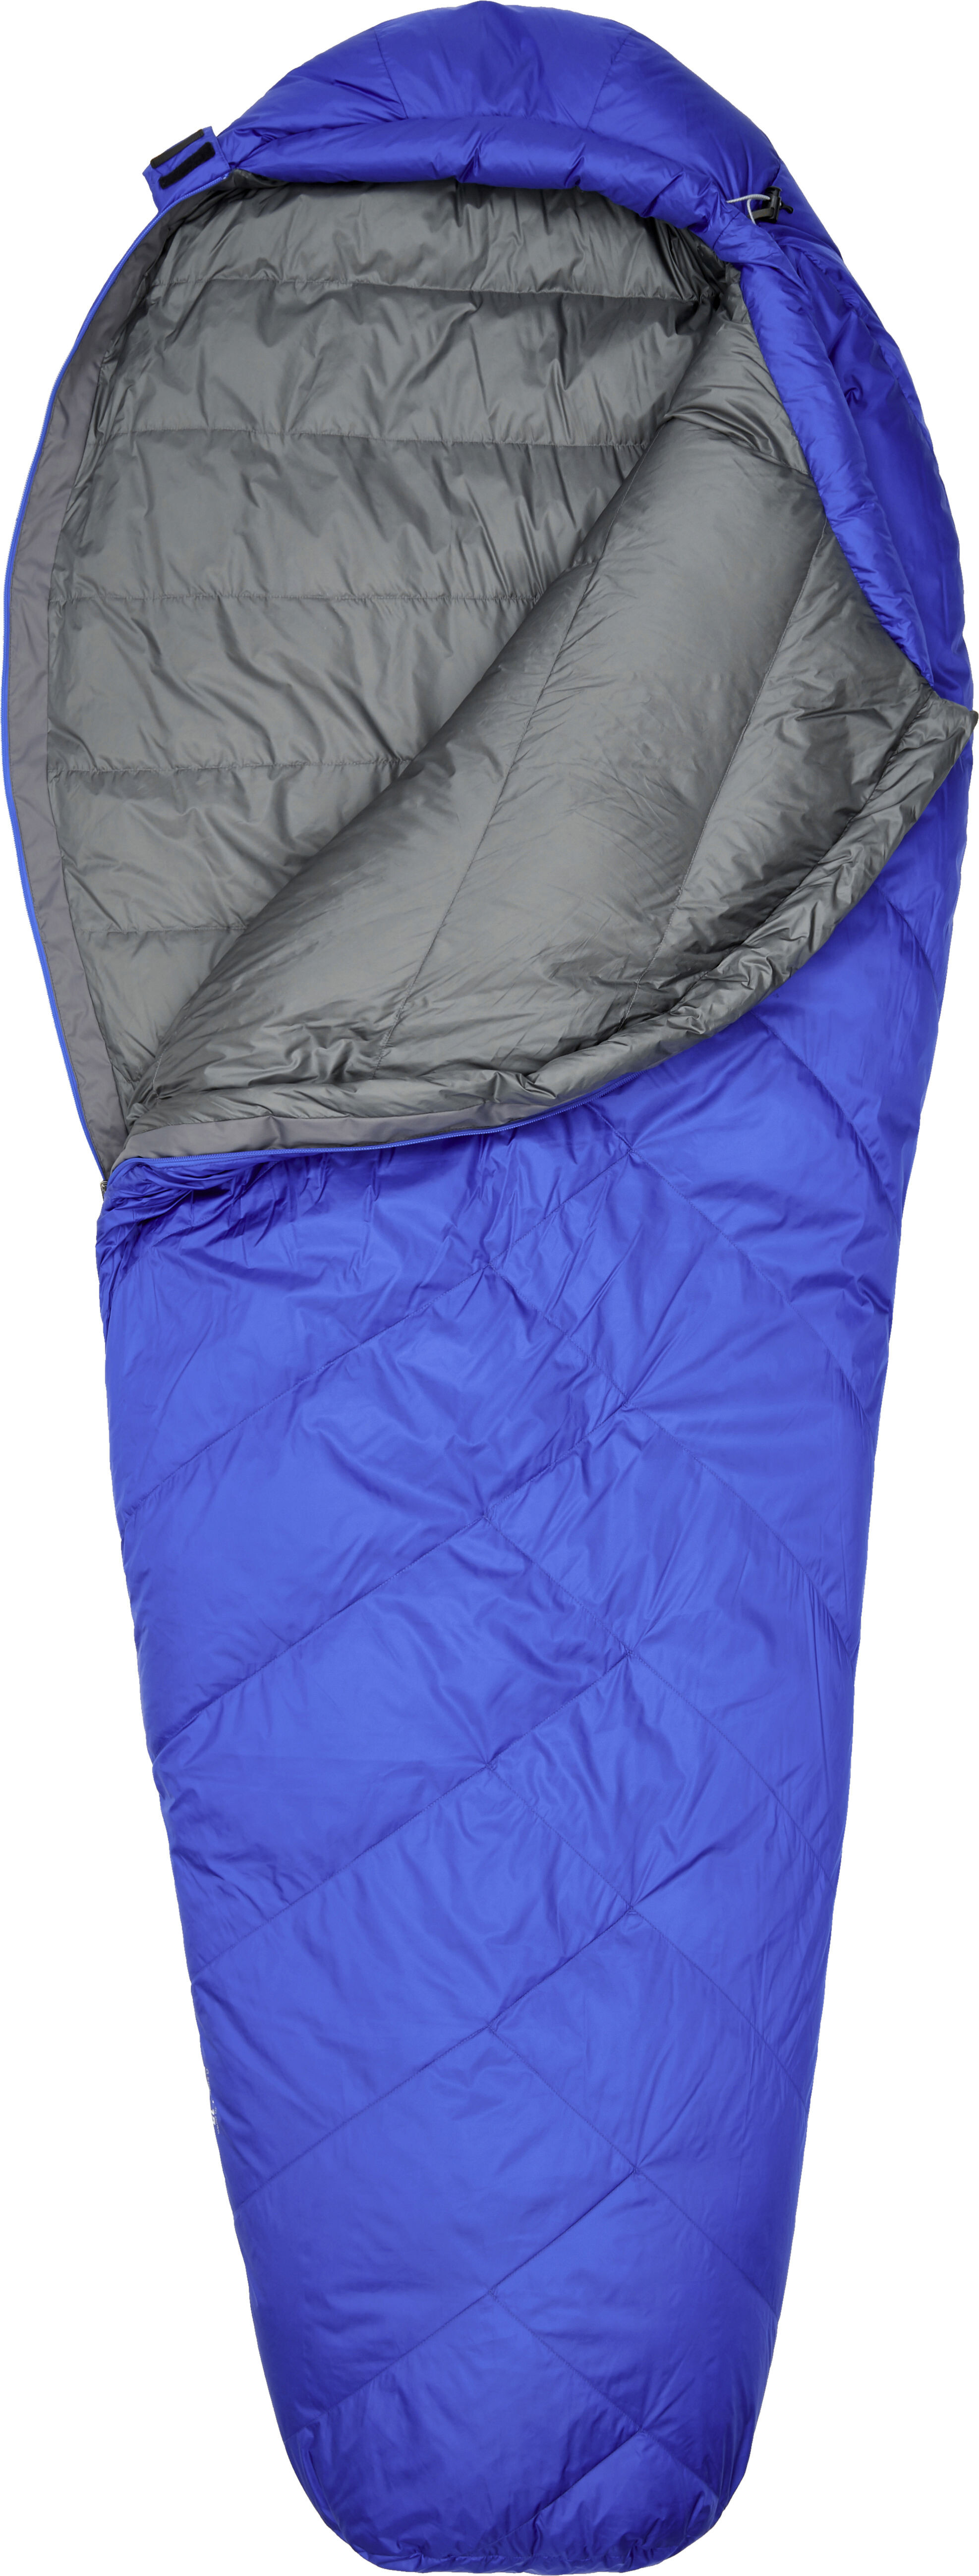 Mountain Hardwear Ratio 15 Sleeping Bag blue at Addnature ...